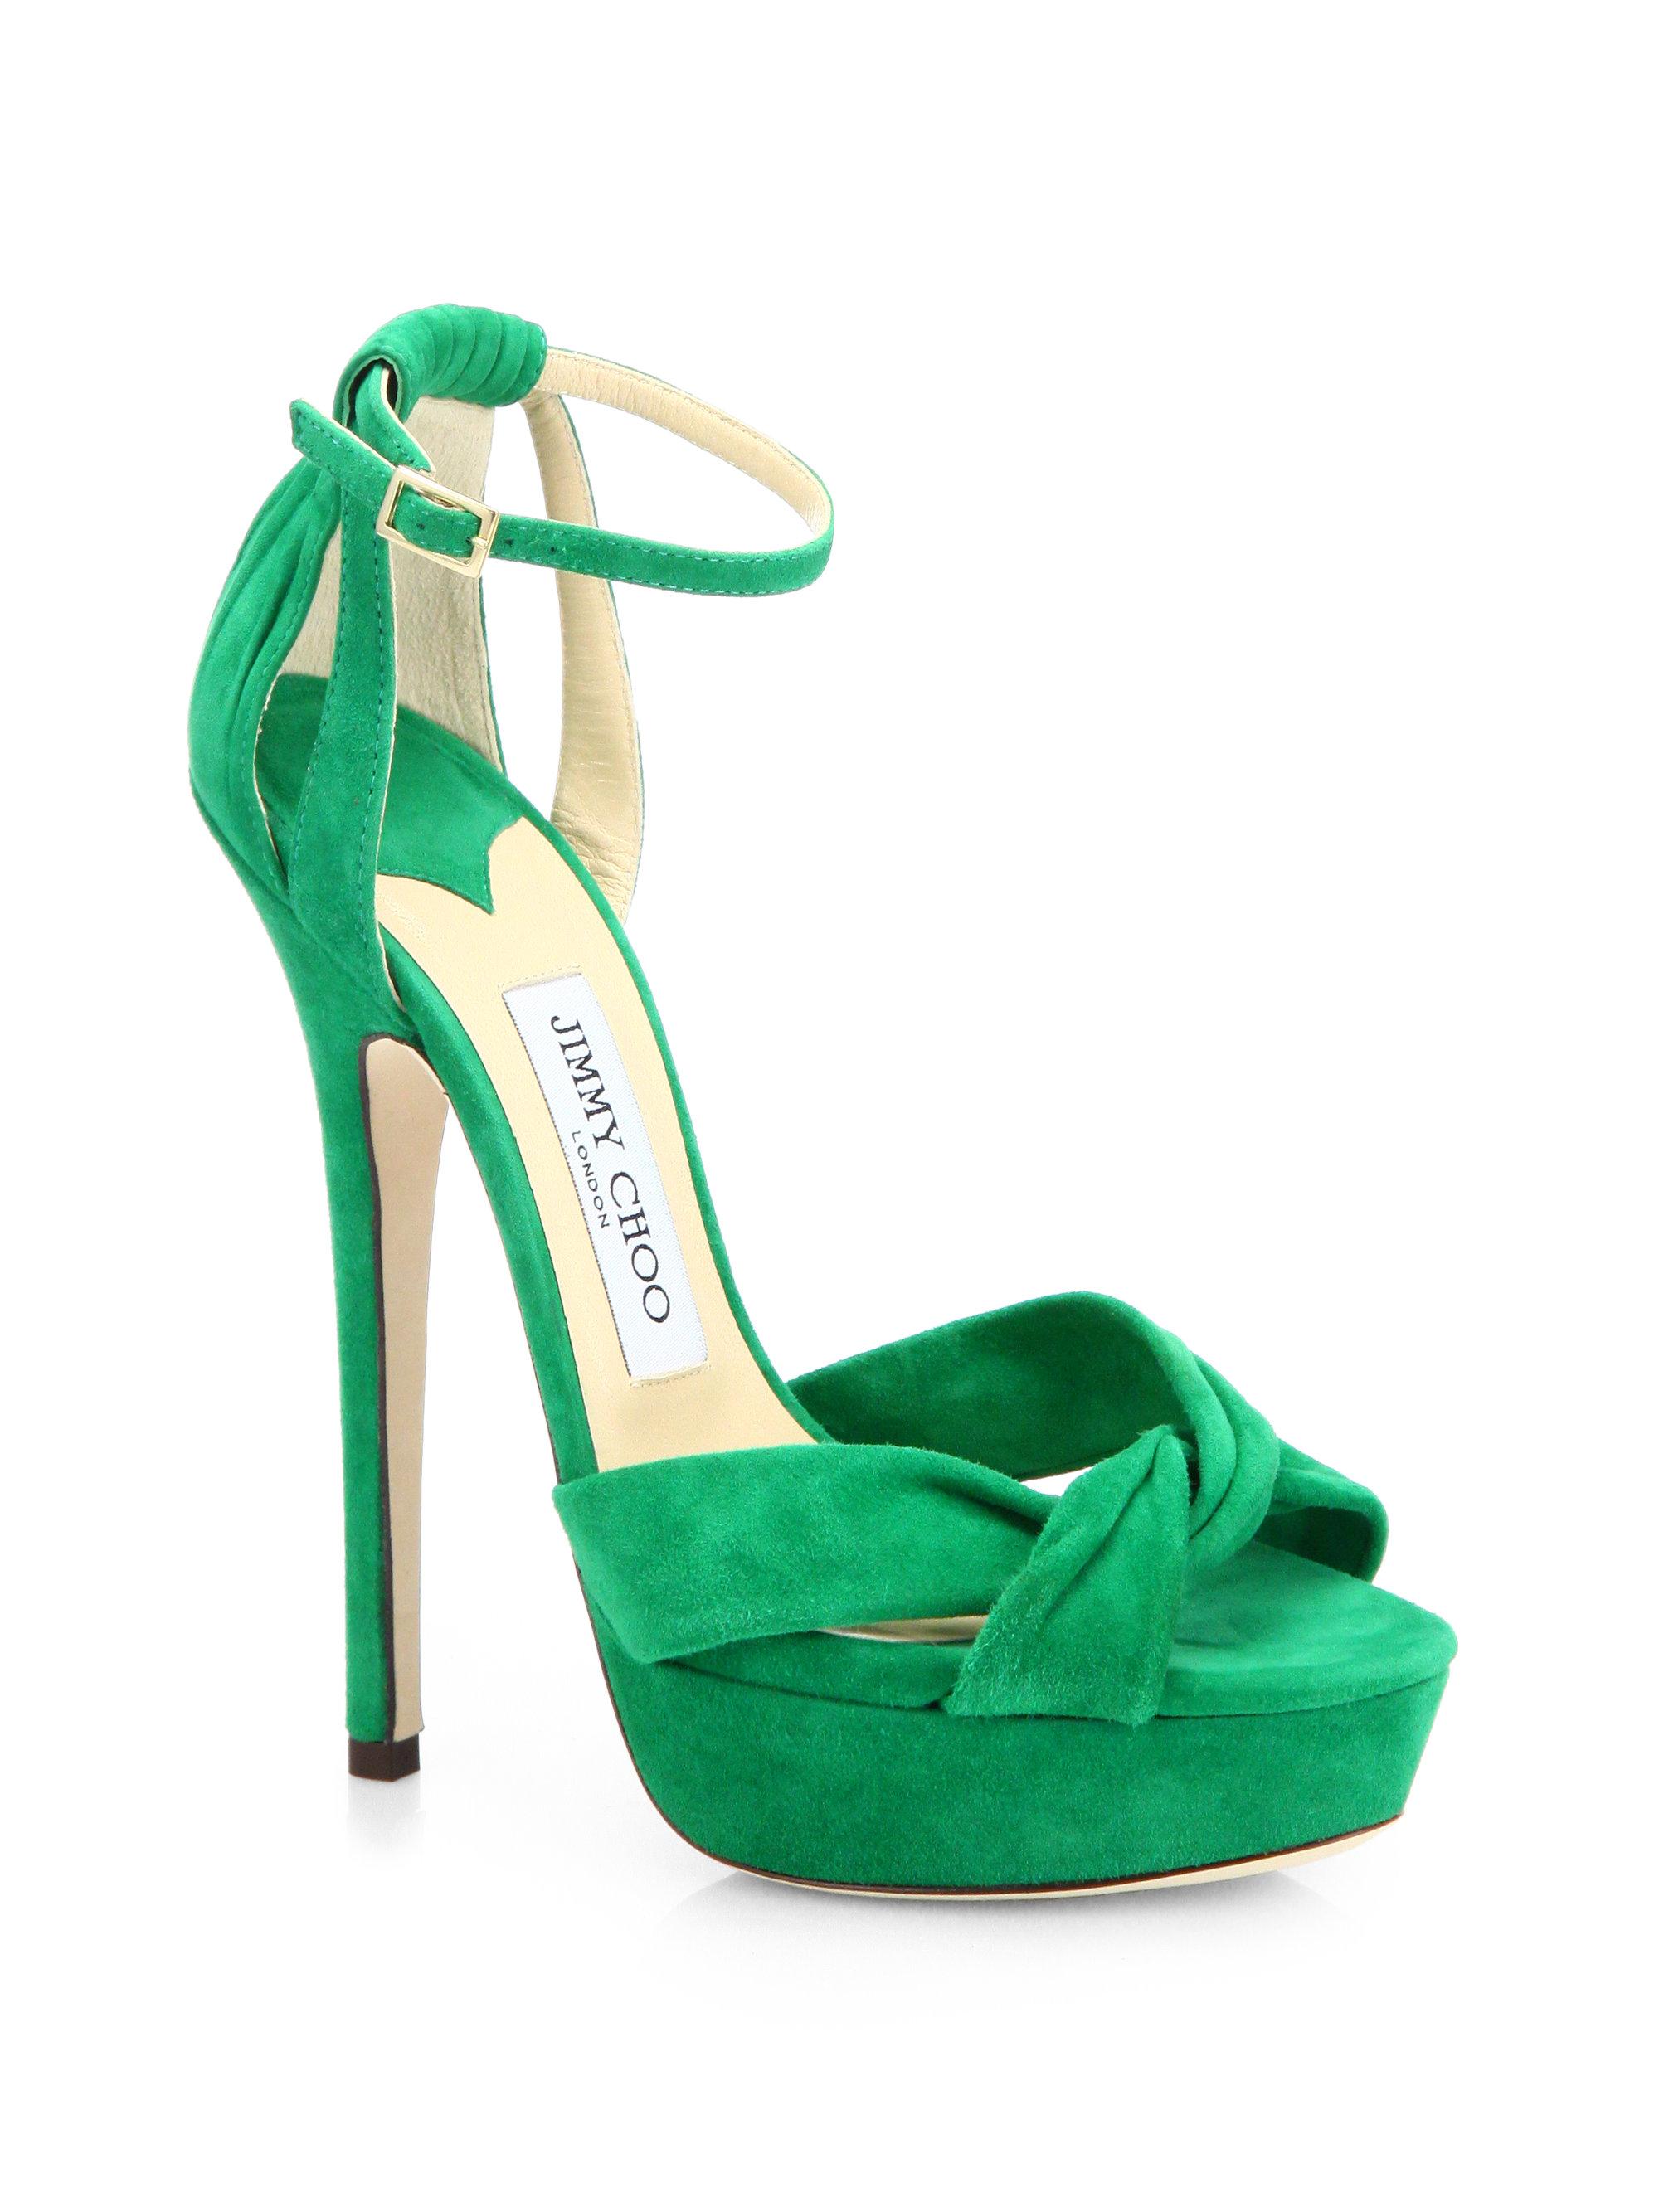 cb00d2d0f37 Lyst - Jimmy Choo Greta Suede Ankle Strap Platform Sandals in Green